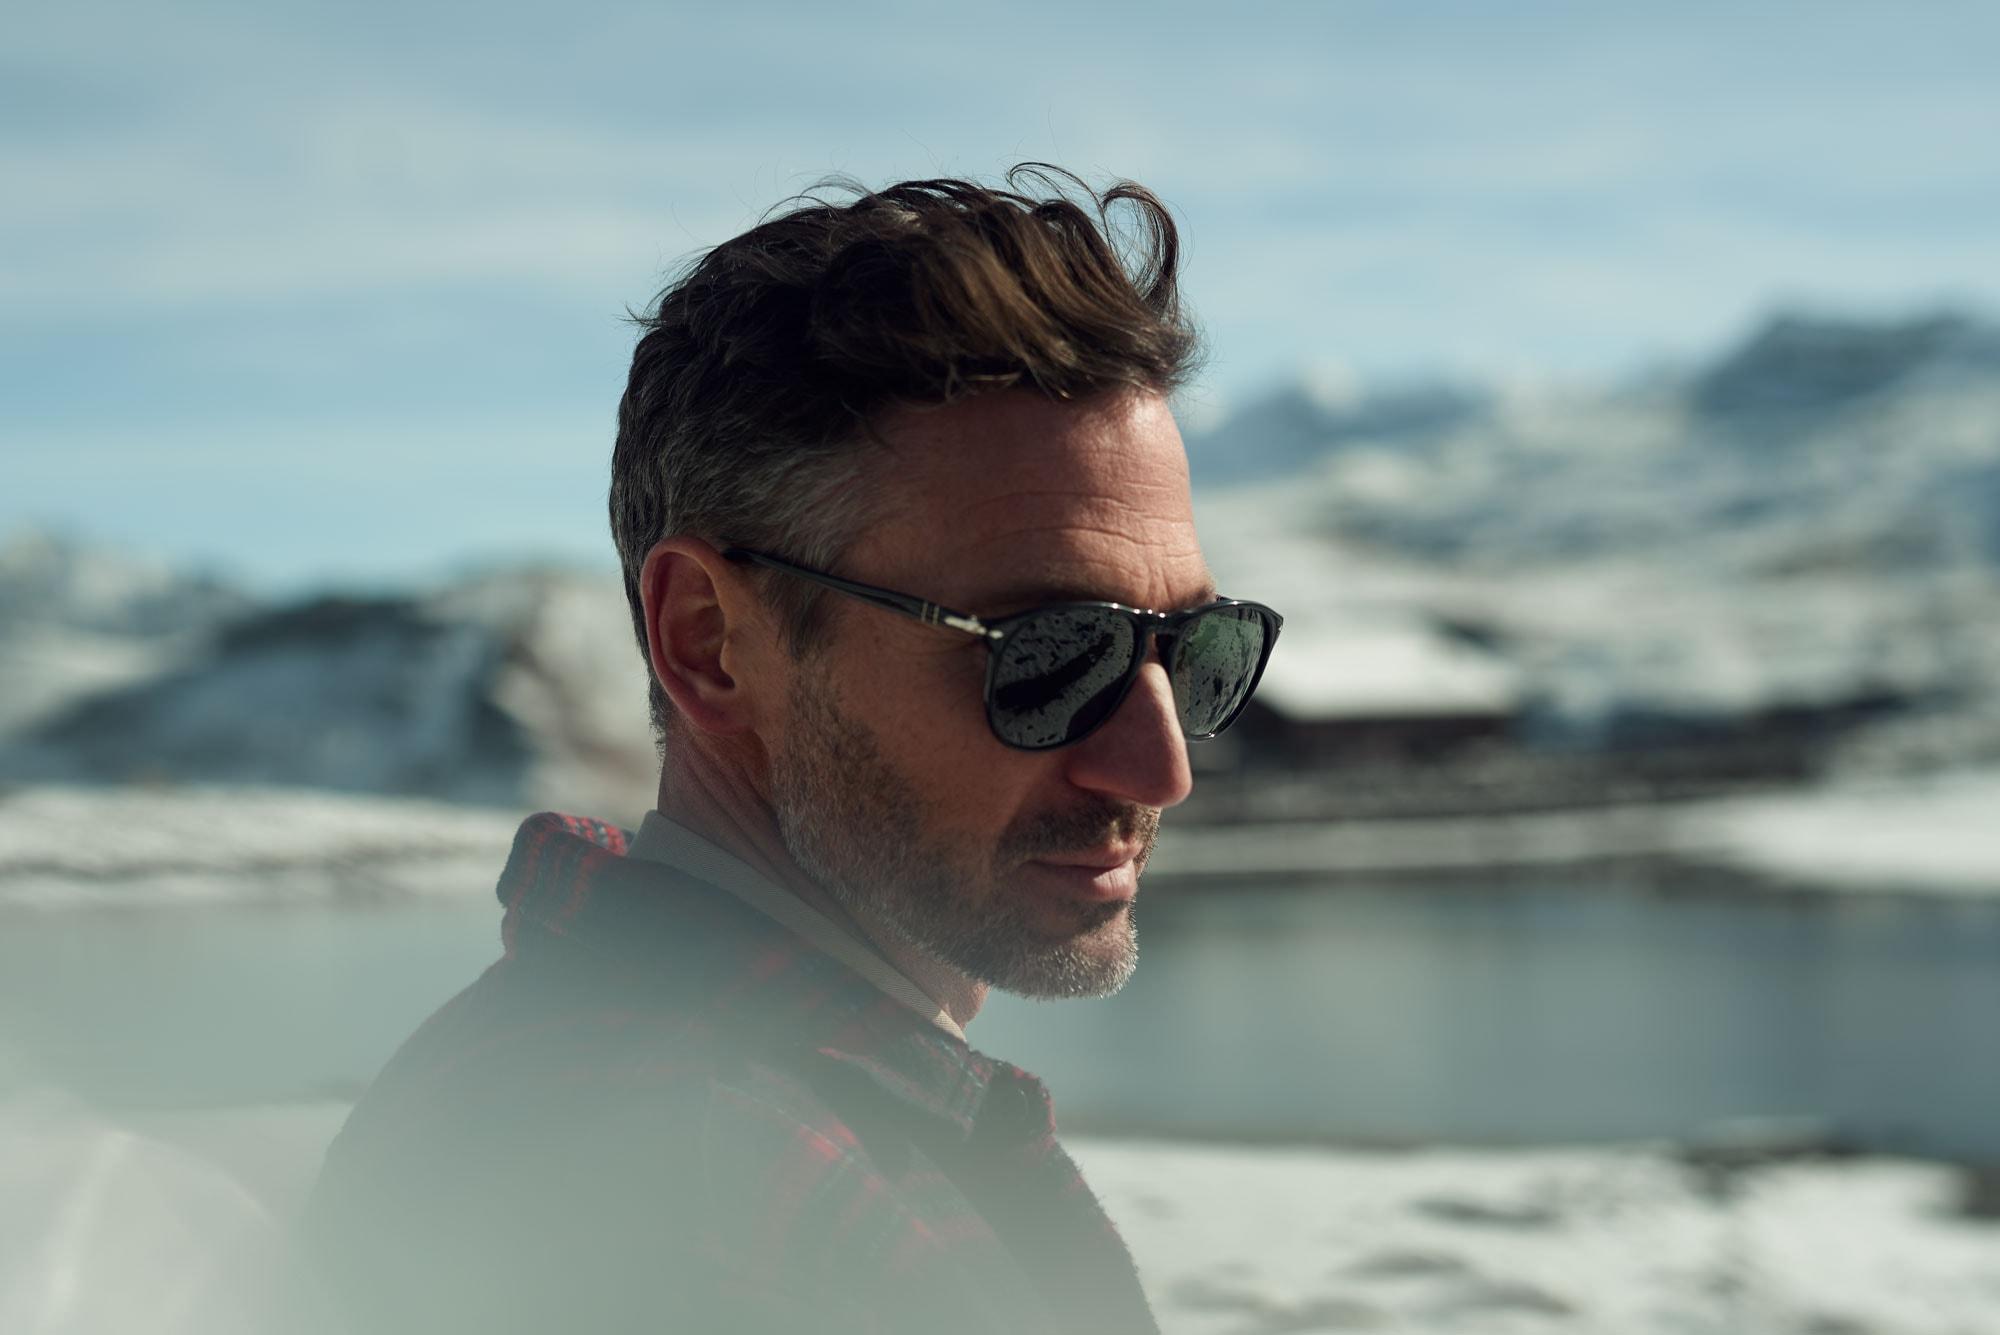 johannes kuehn photography and cgi berlin The Alps with Audi